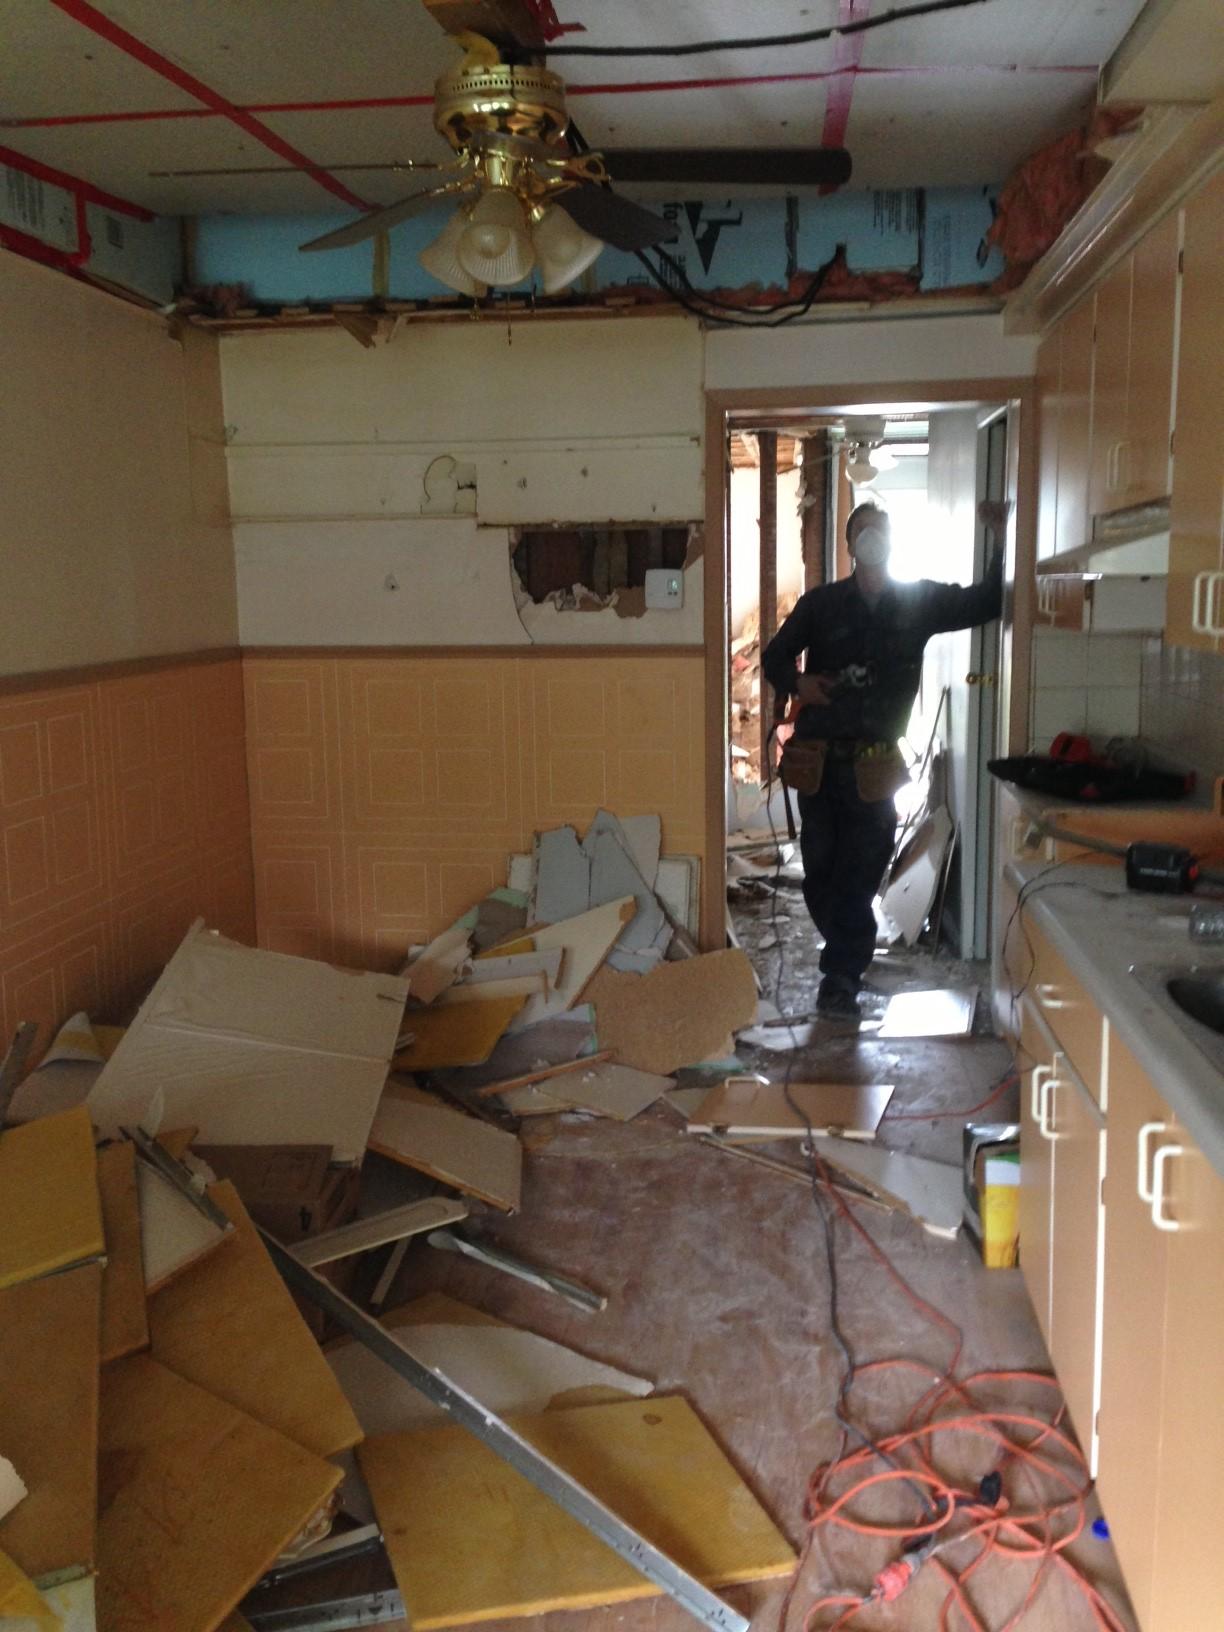 Kitchen being dismantled